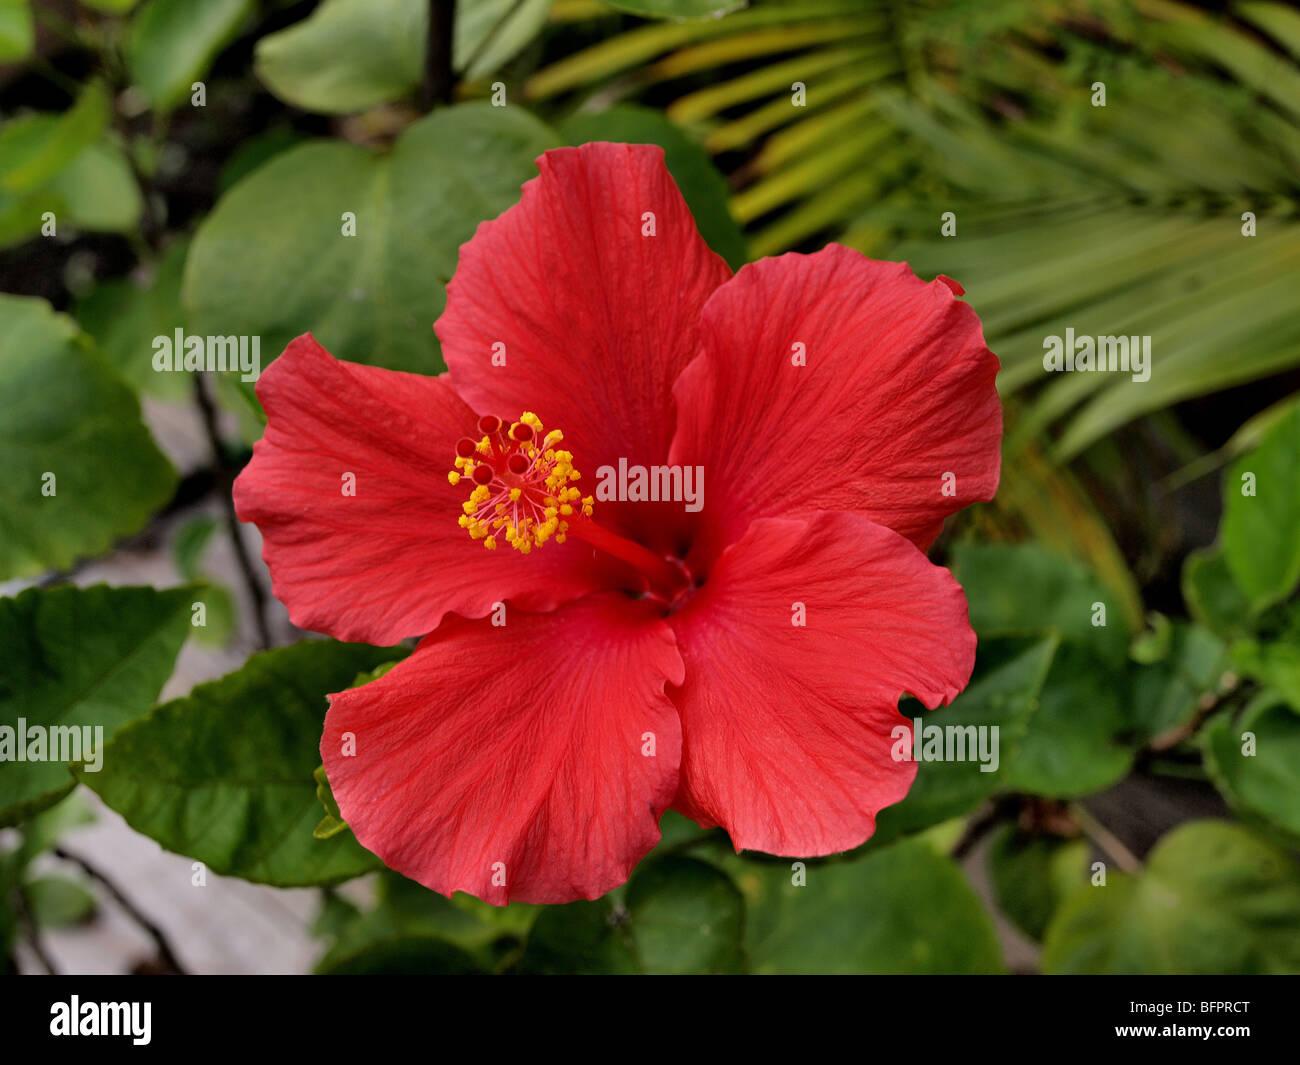 Red flower with yellow stamen oriental hibiscus with green foliage red flower with yellow stamen oriental hibiscus with green foliage in background mightylinksfo